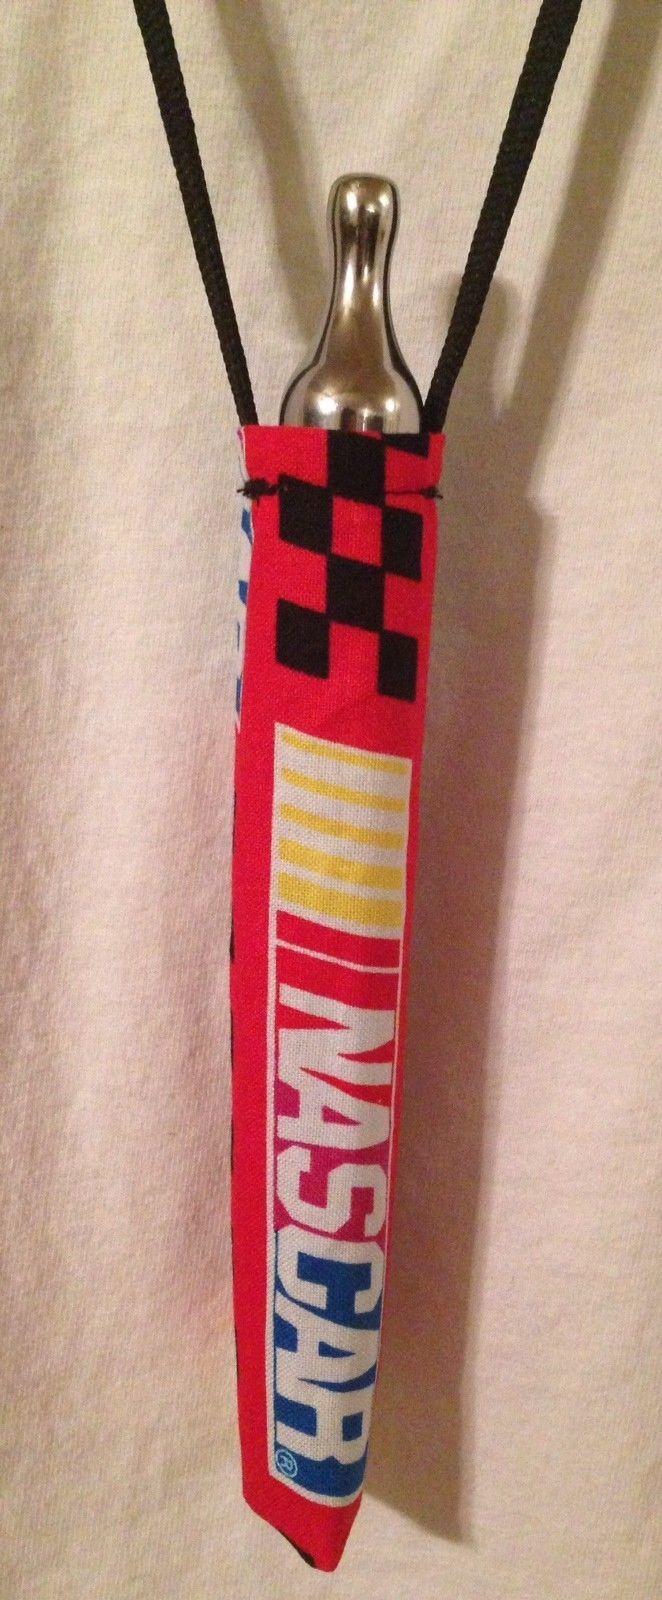 E-cigarette Lanyards ego holder key chain ecig case e-cig epen NASCAR Racing